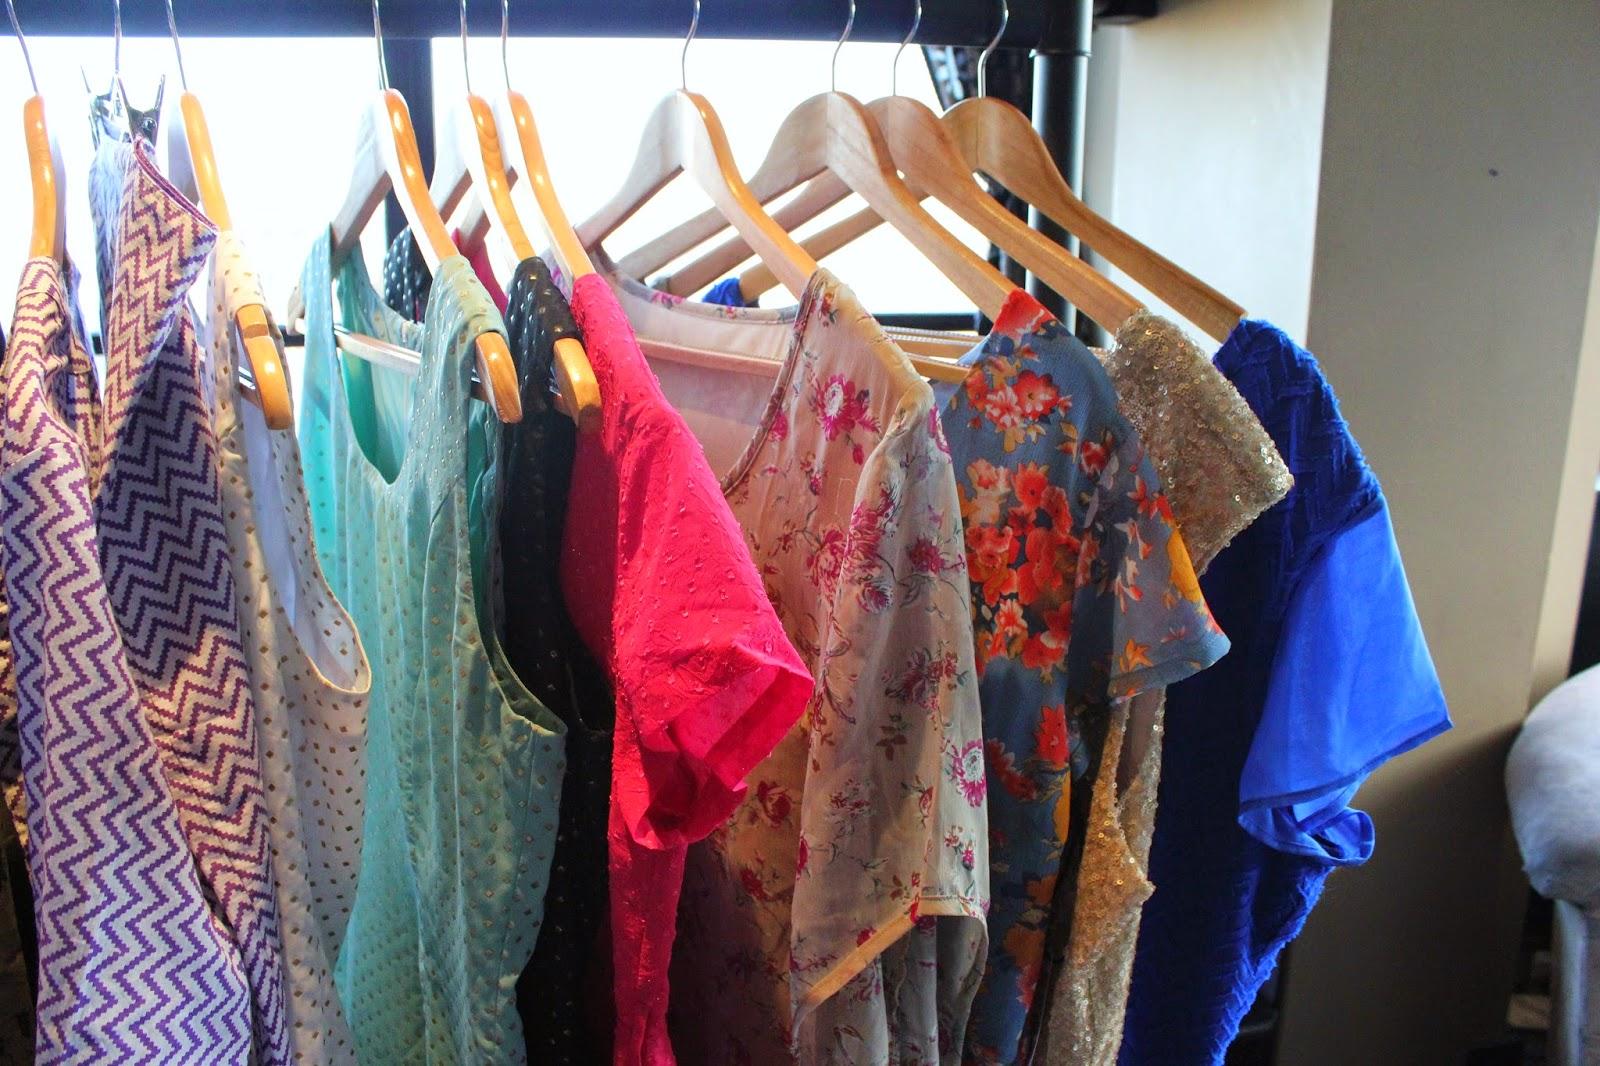 bloggers-love-fashion-week-clothes